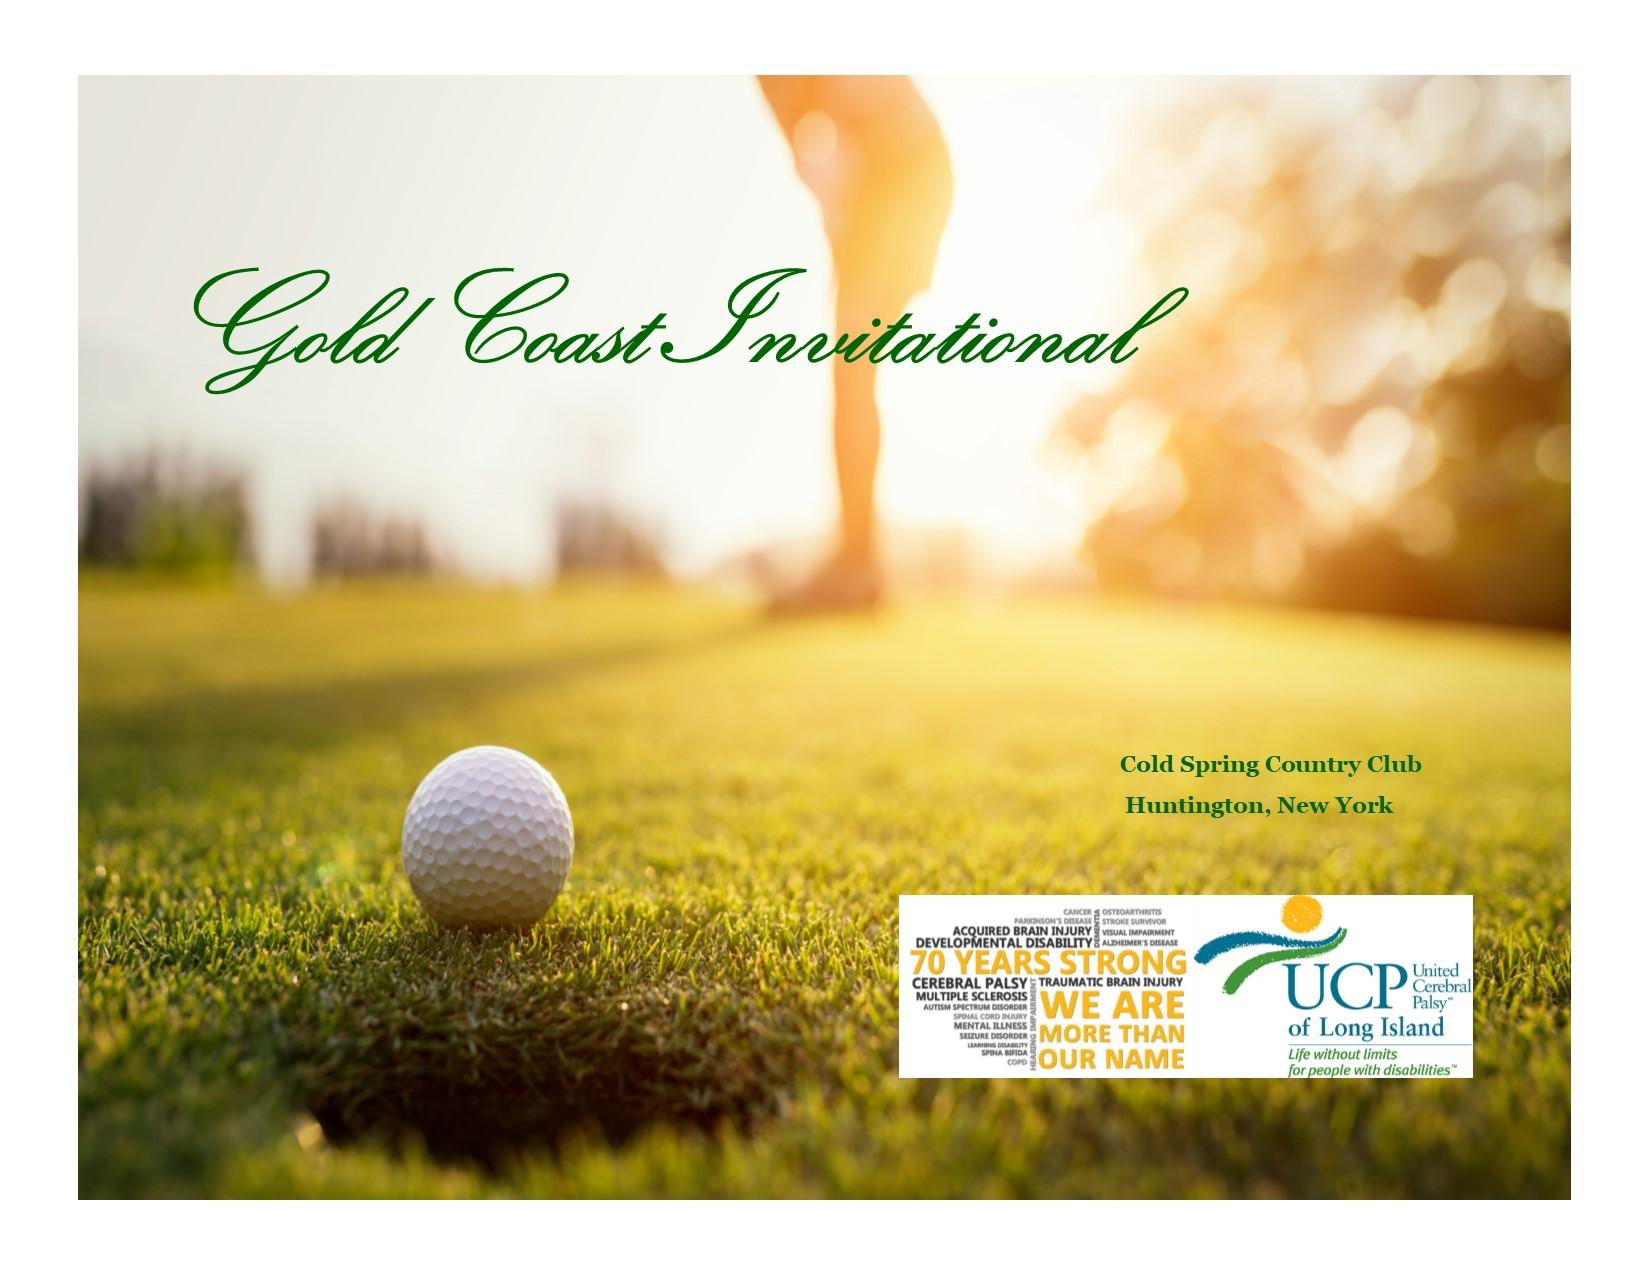 Gold Coast Invitational